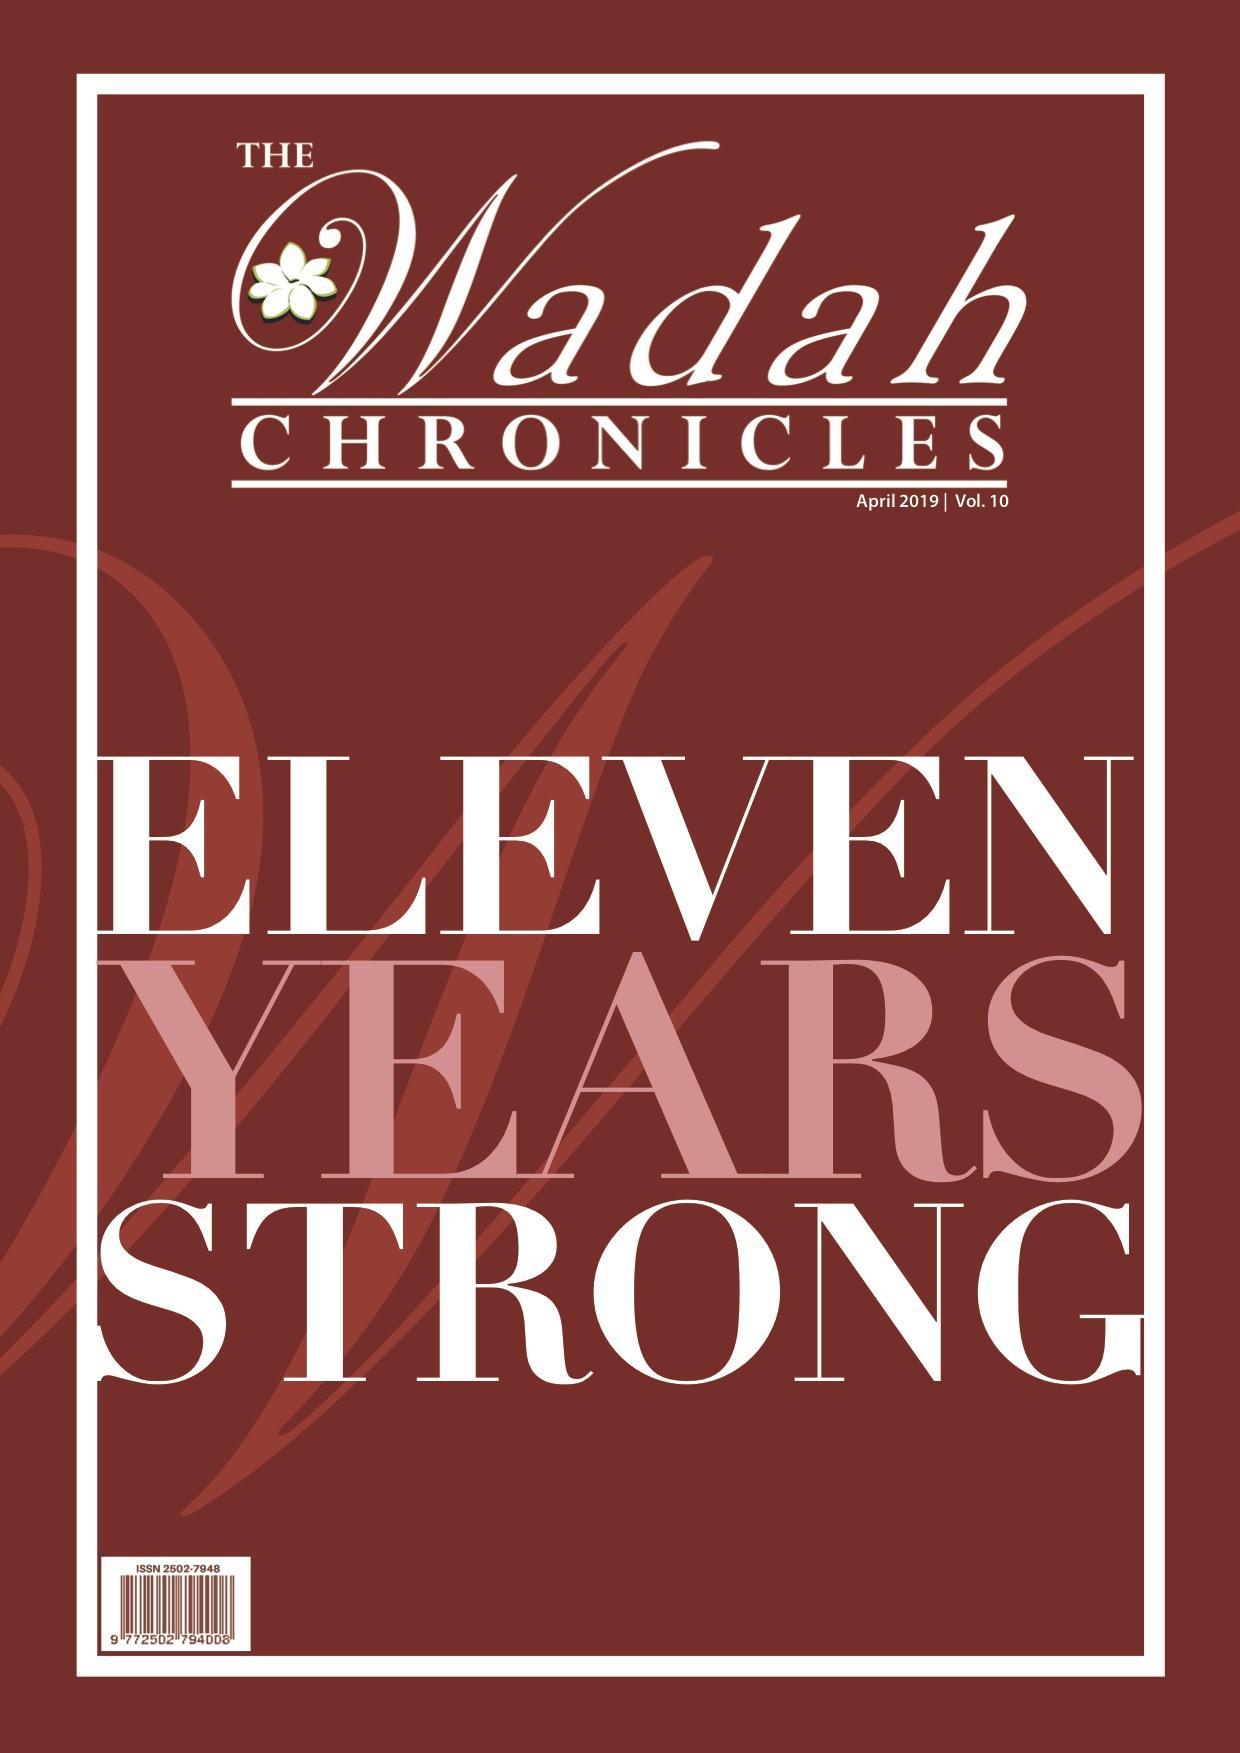 Wadah Chronicles - April 2019